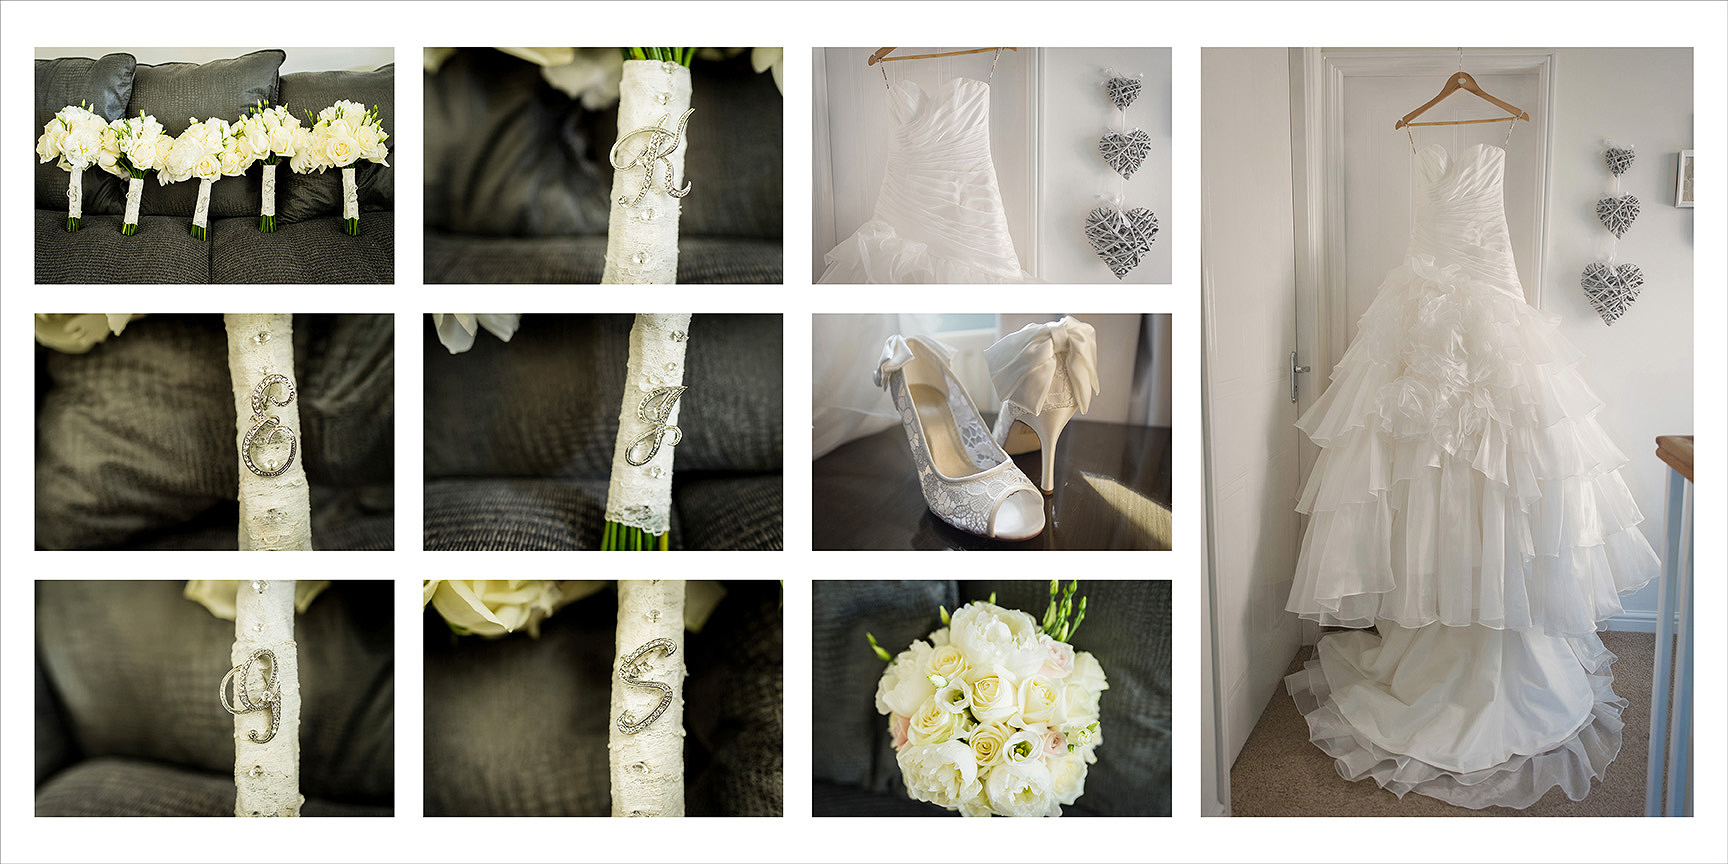 wedding album using grid layout in design